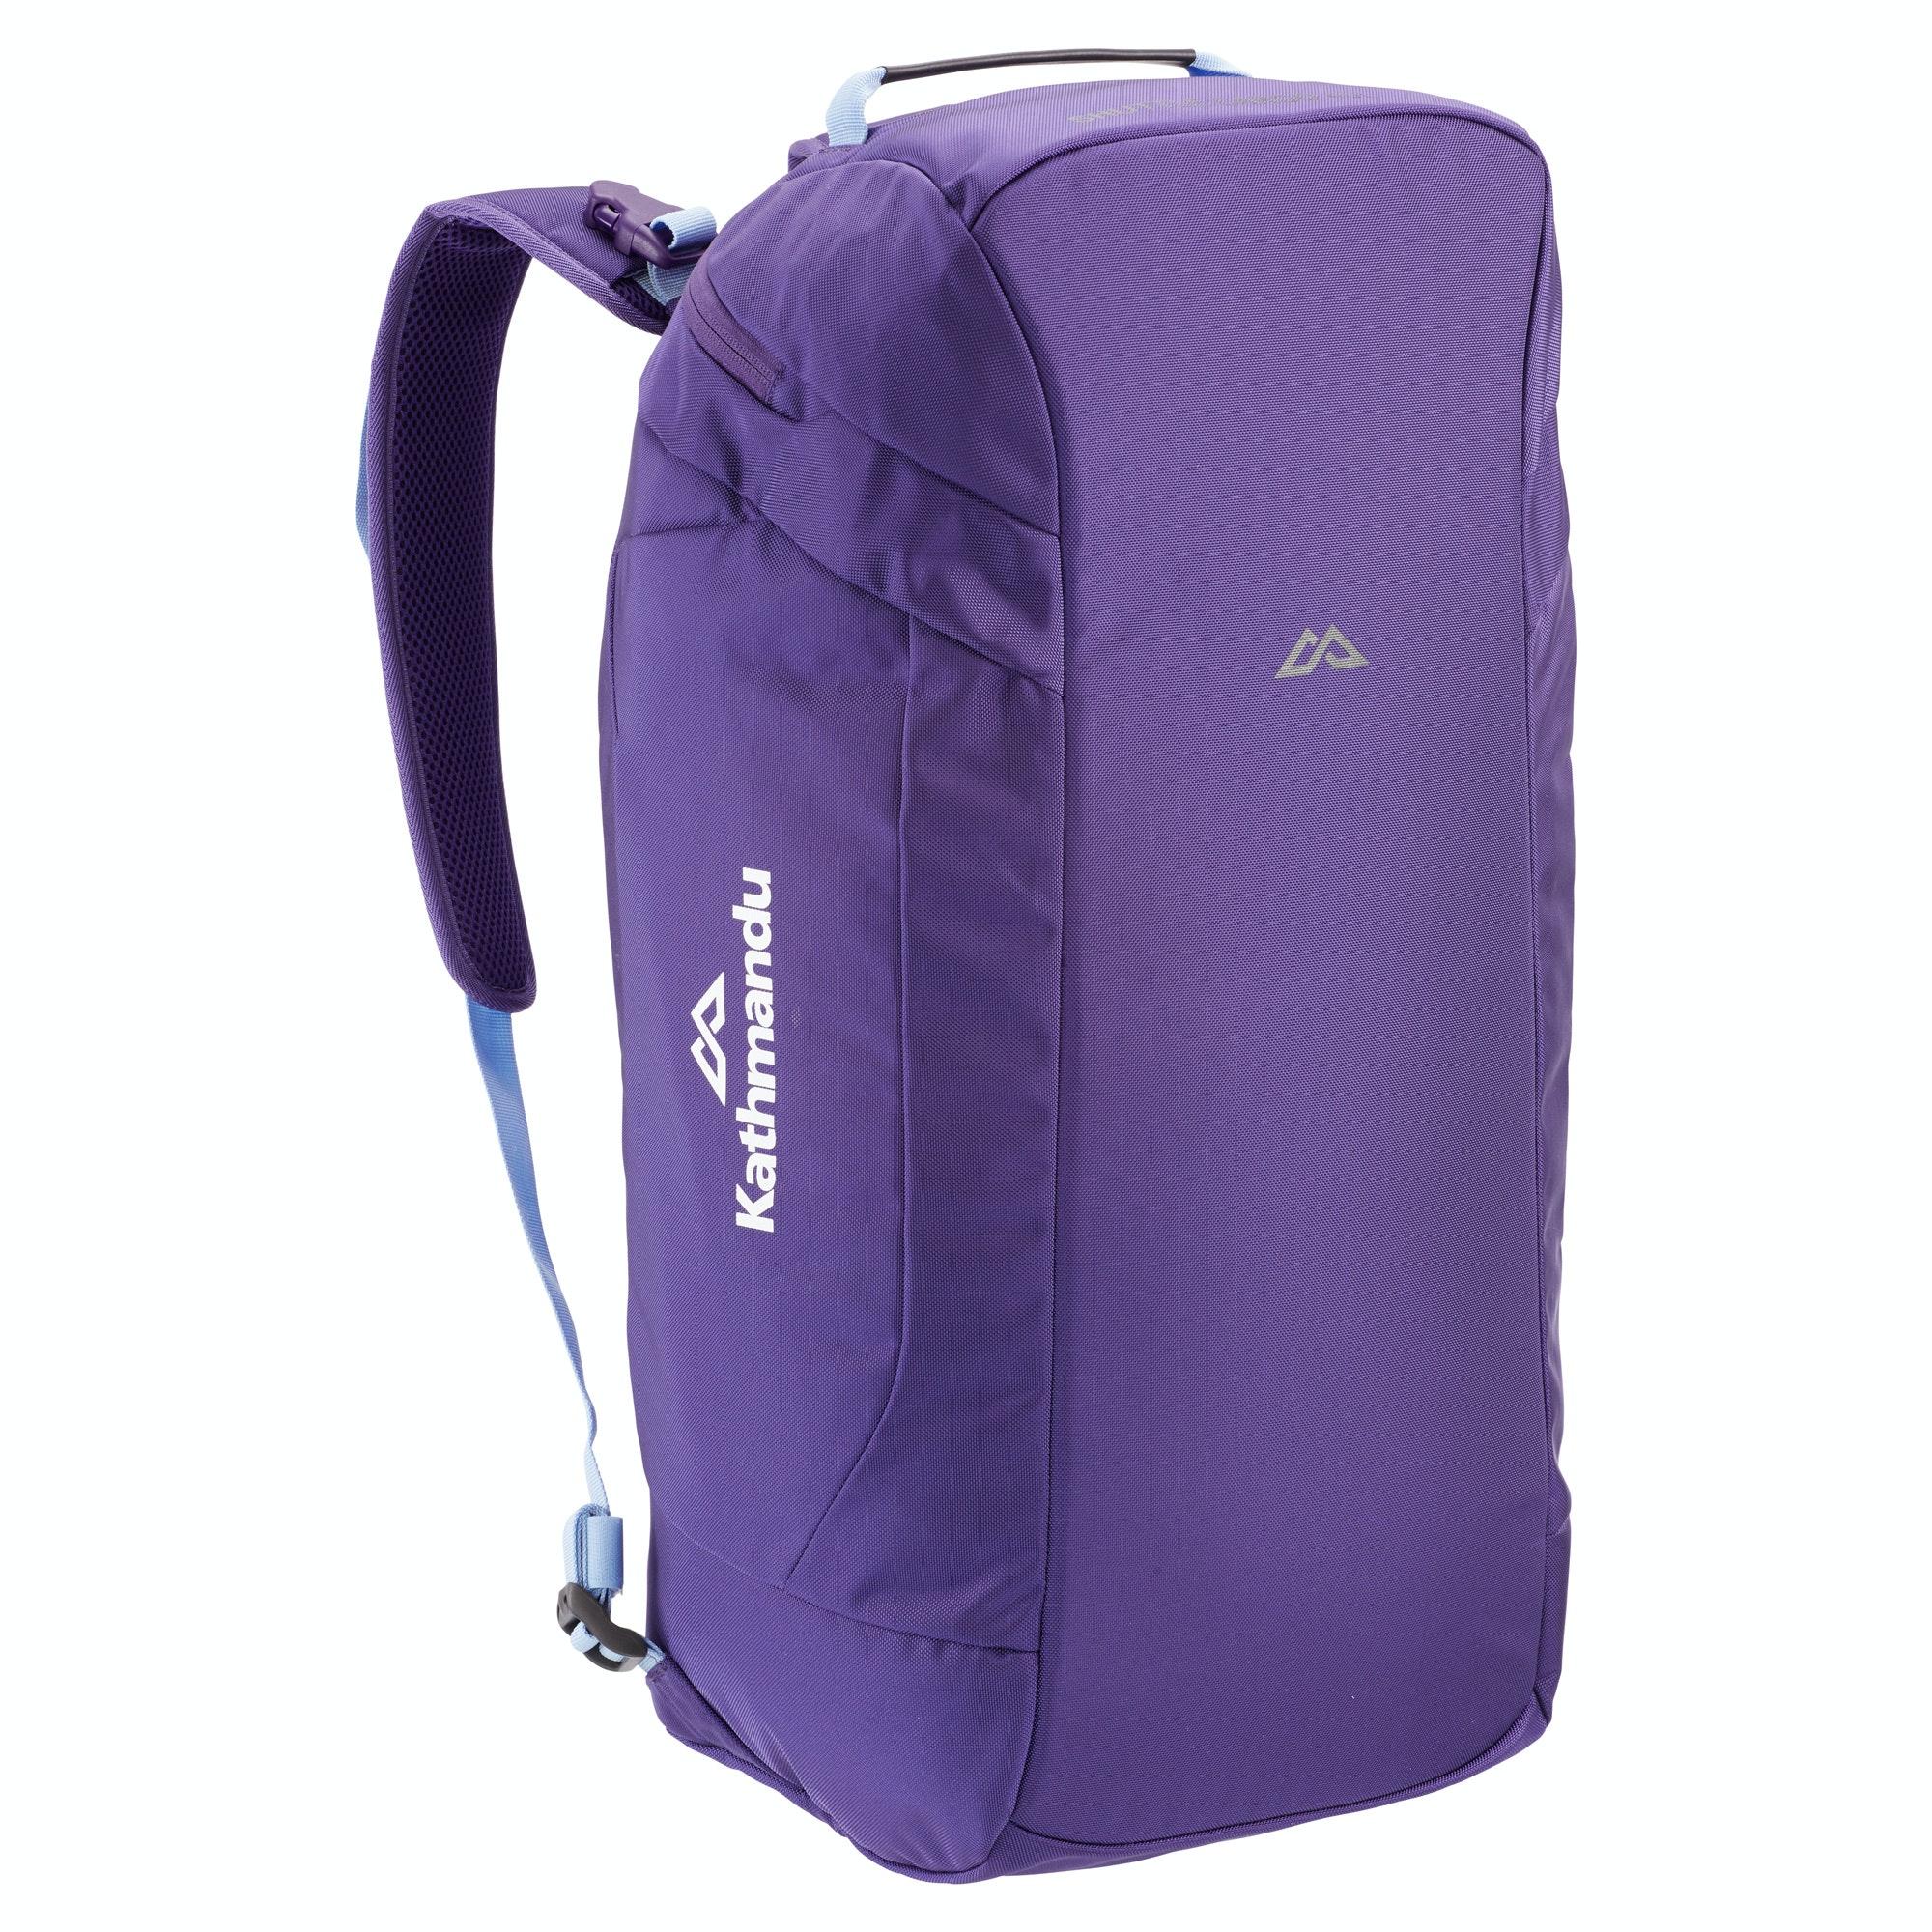 Kathmandu Shuttle Convertible Travel Backpack Duffle Cargo Bag 40l ... 3b3cb6b279a64